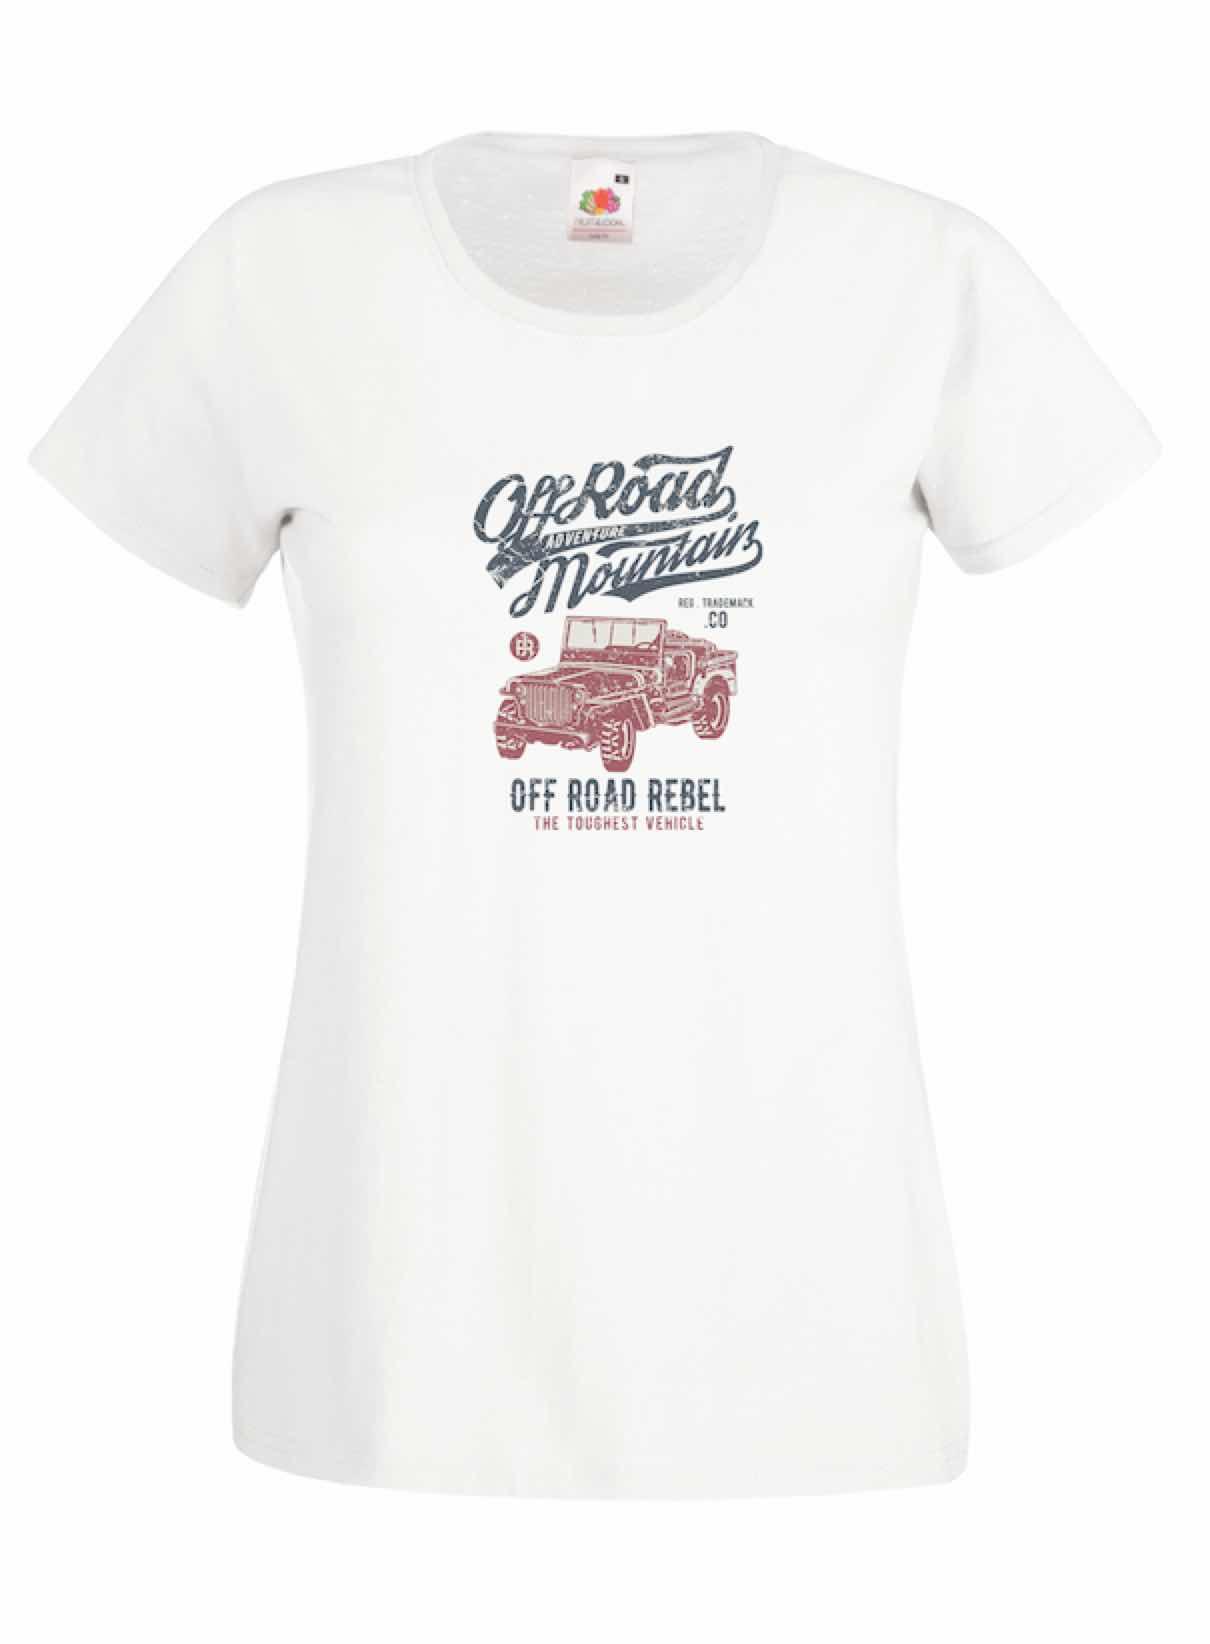 Off Road Jeep design for t-shirt, hoodie & sweatshirt